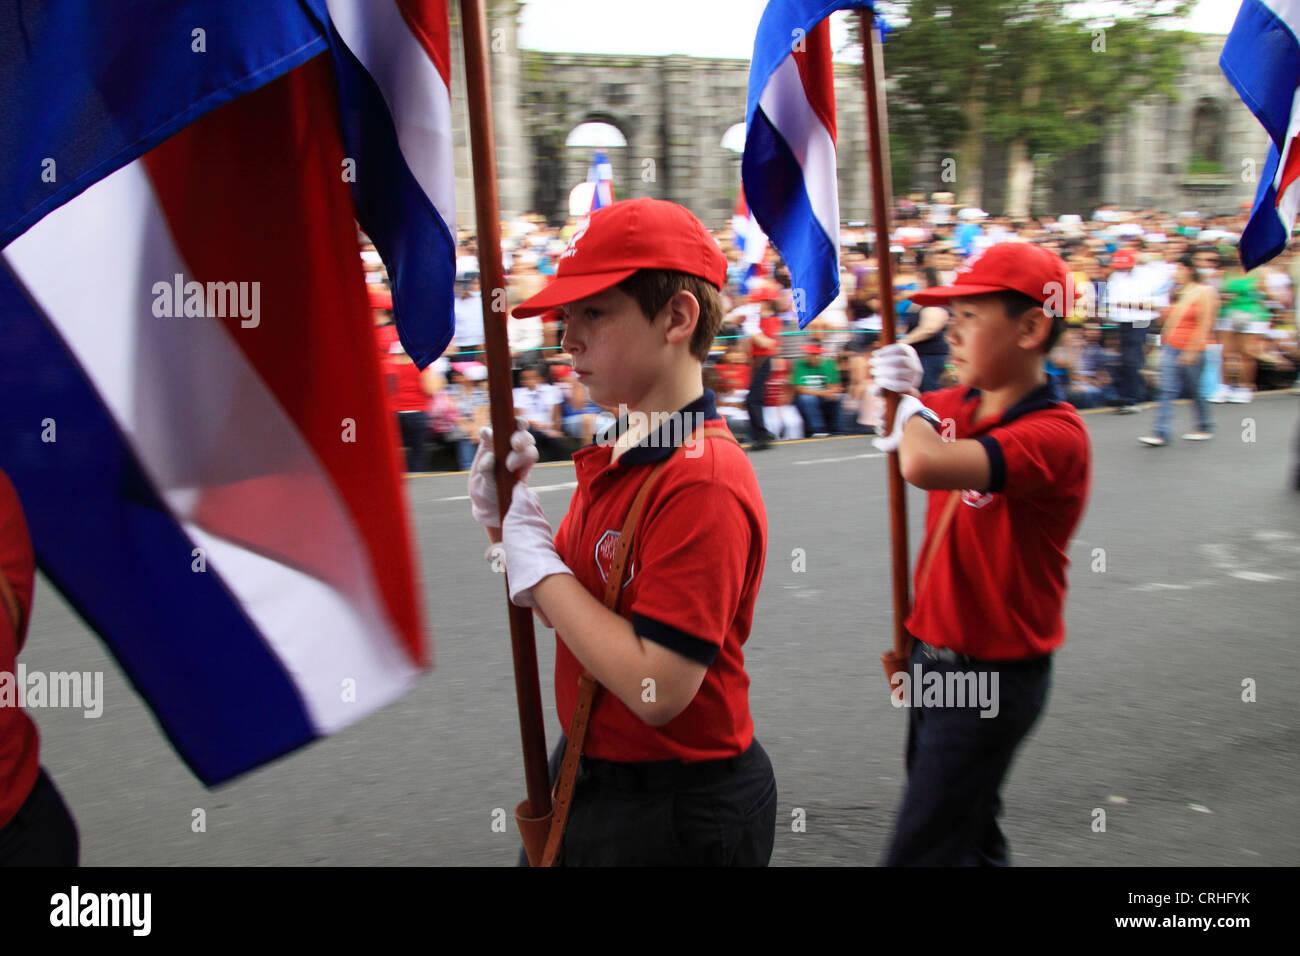 Independence Day Parade am 15. September, Cartago, Costa Rica. Stockbild